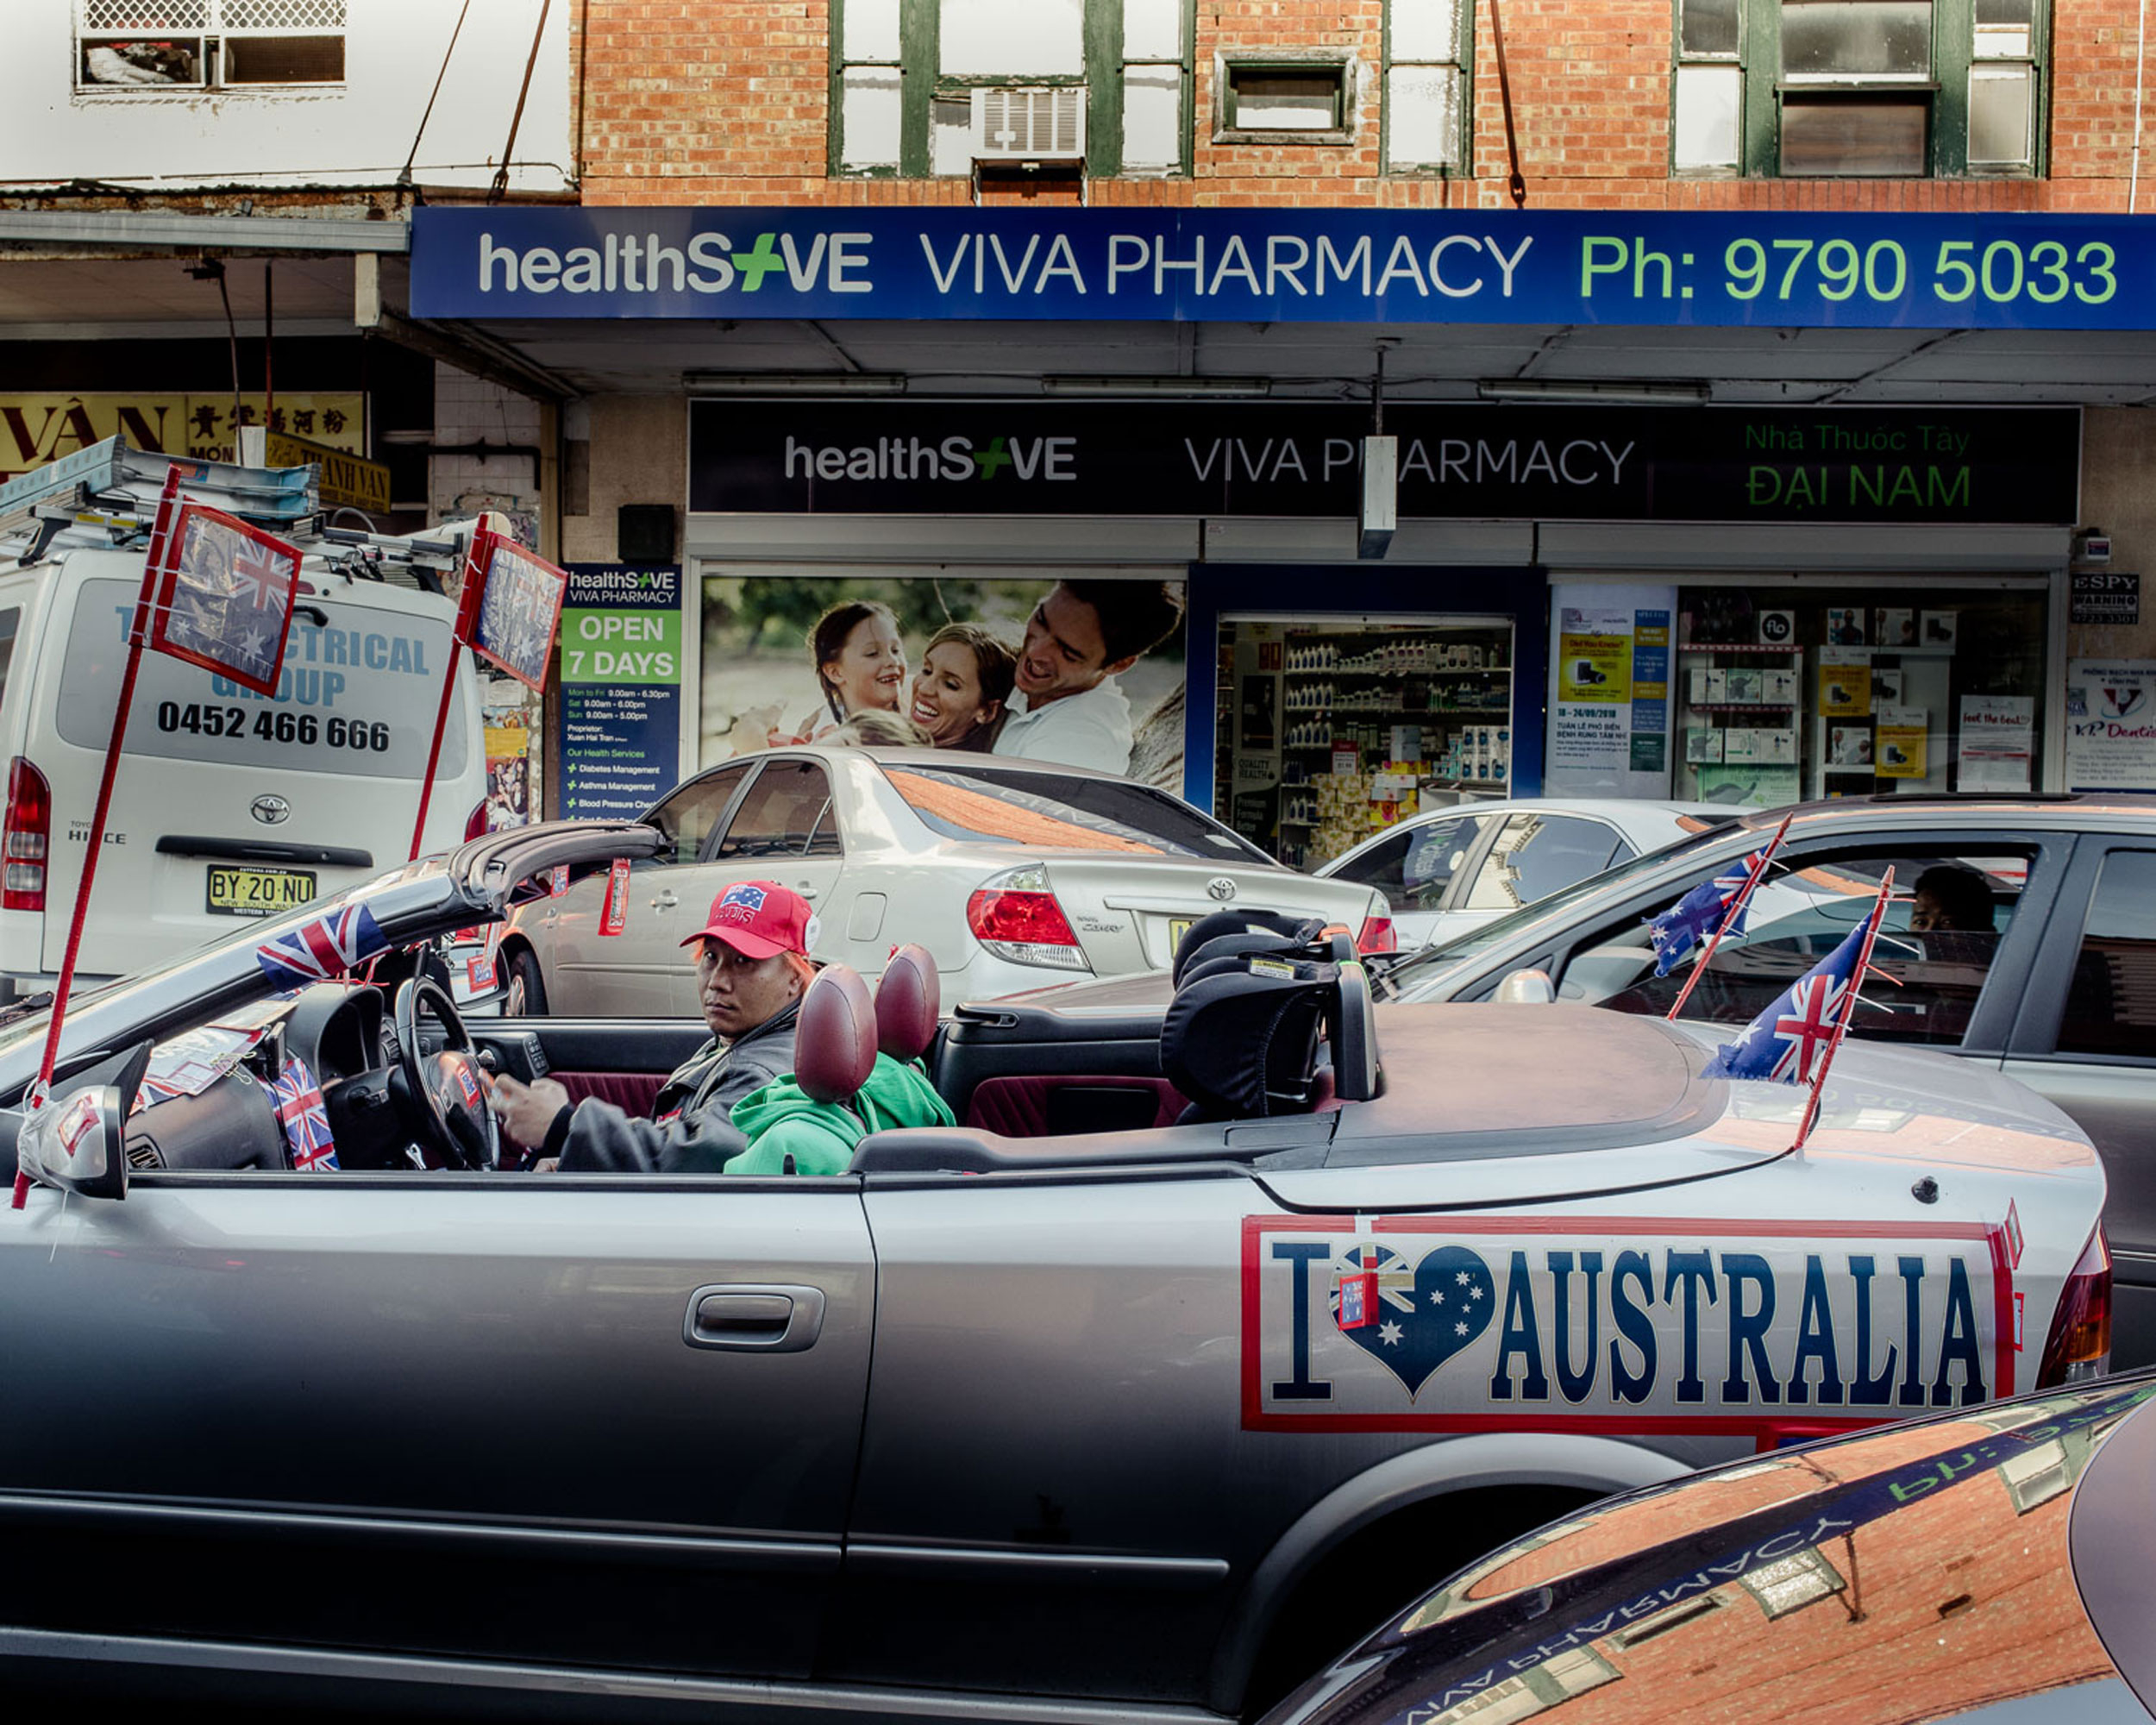 lyndal_Irons_bankstown_convertible.jpg